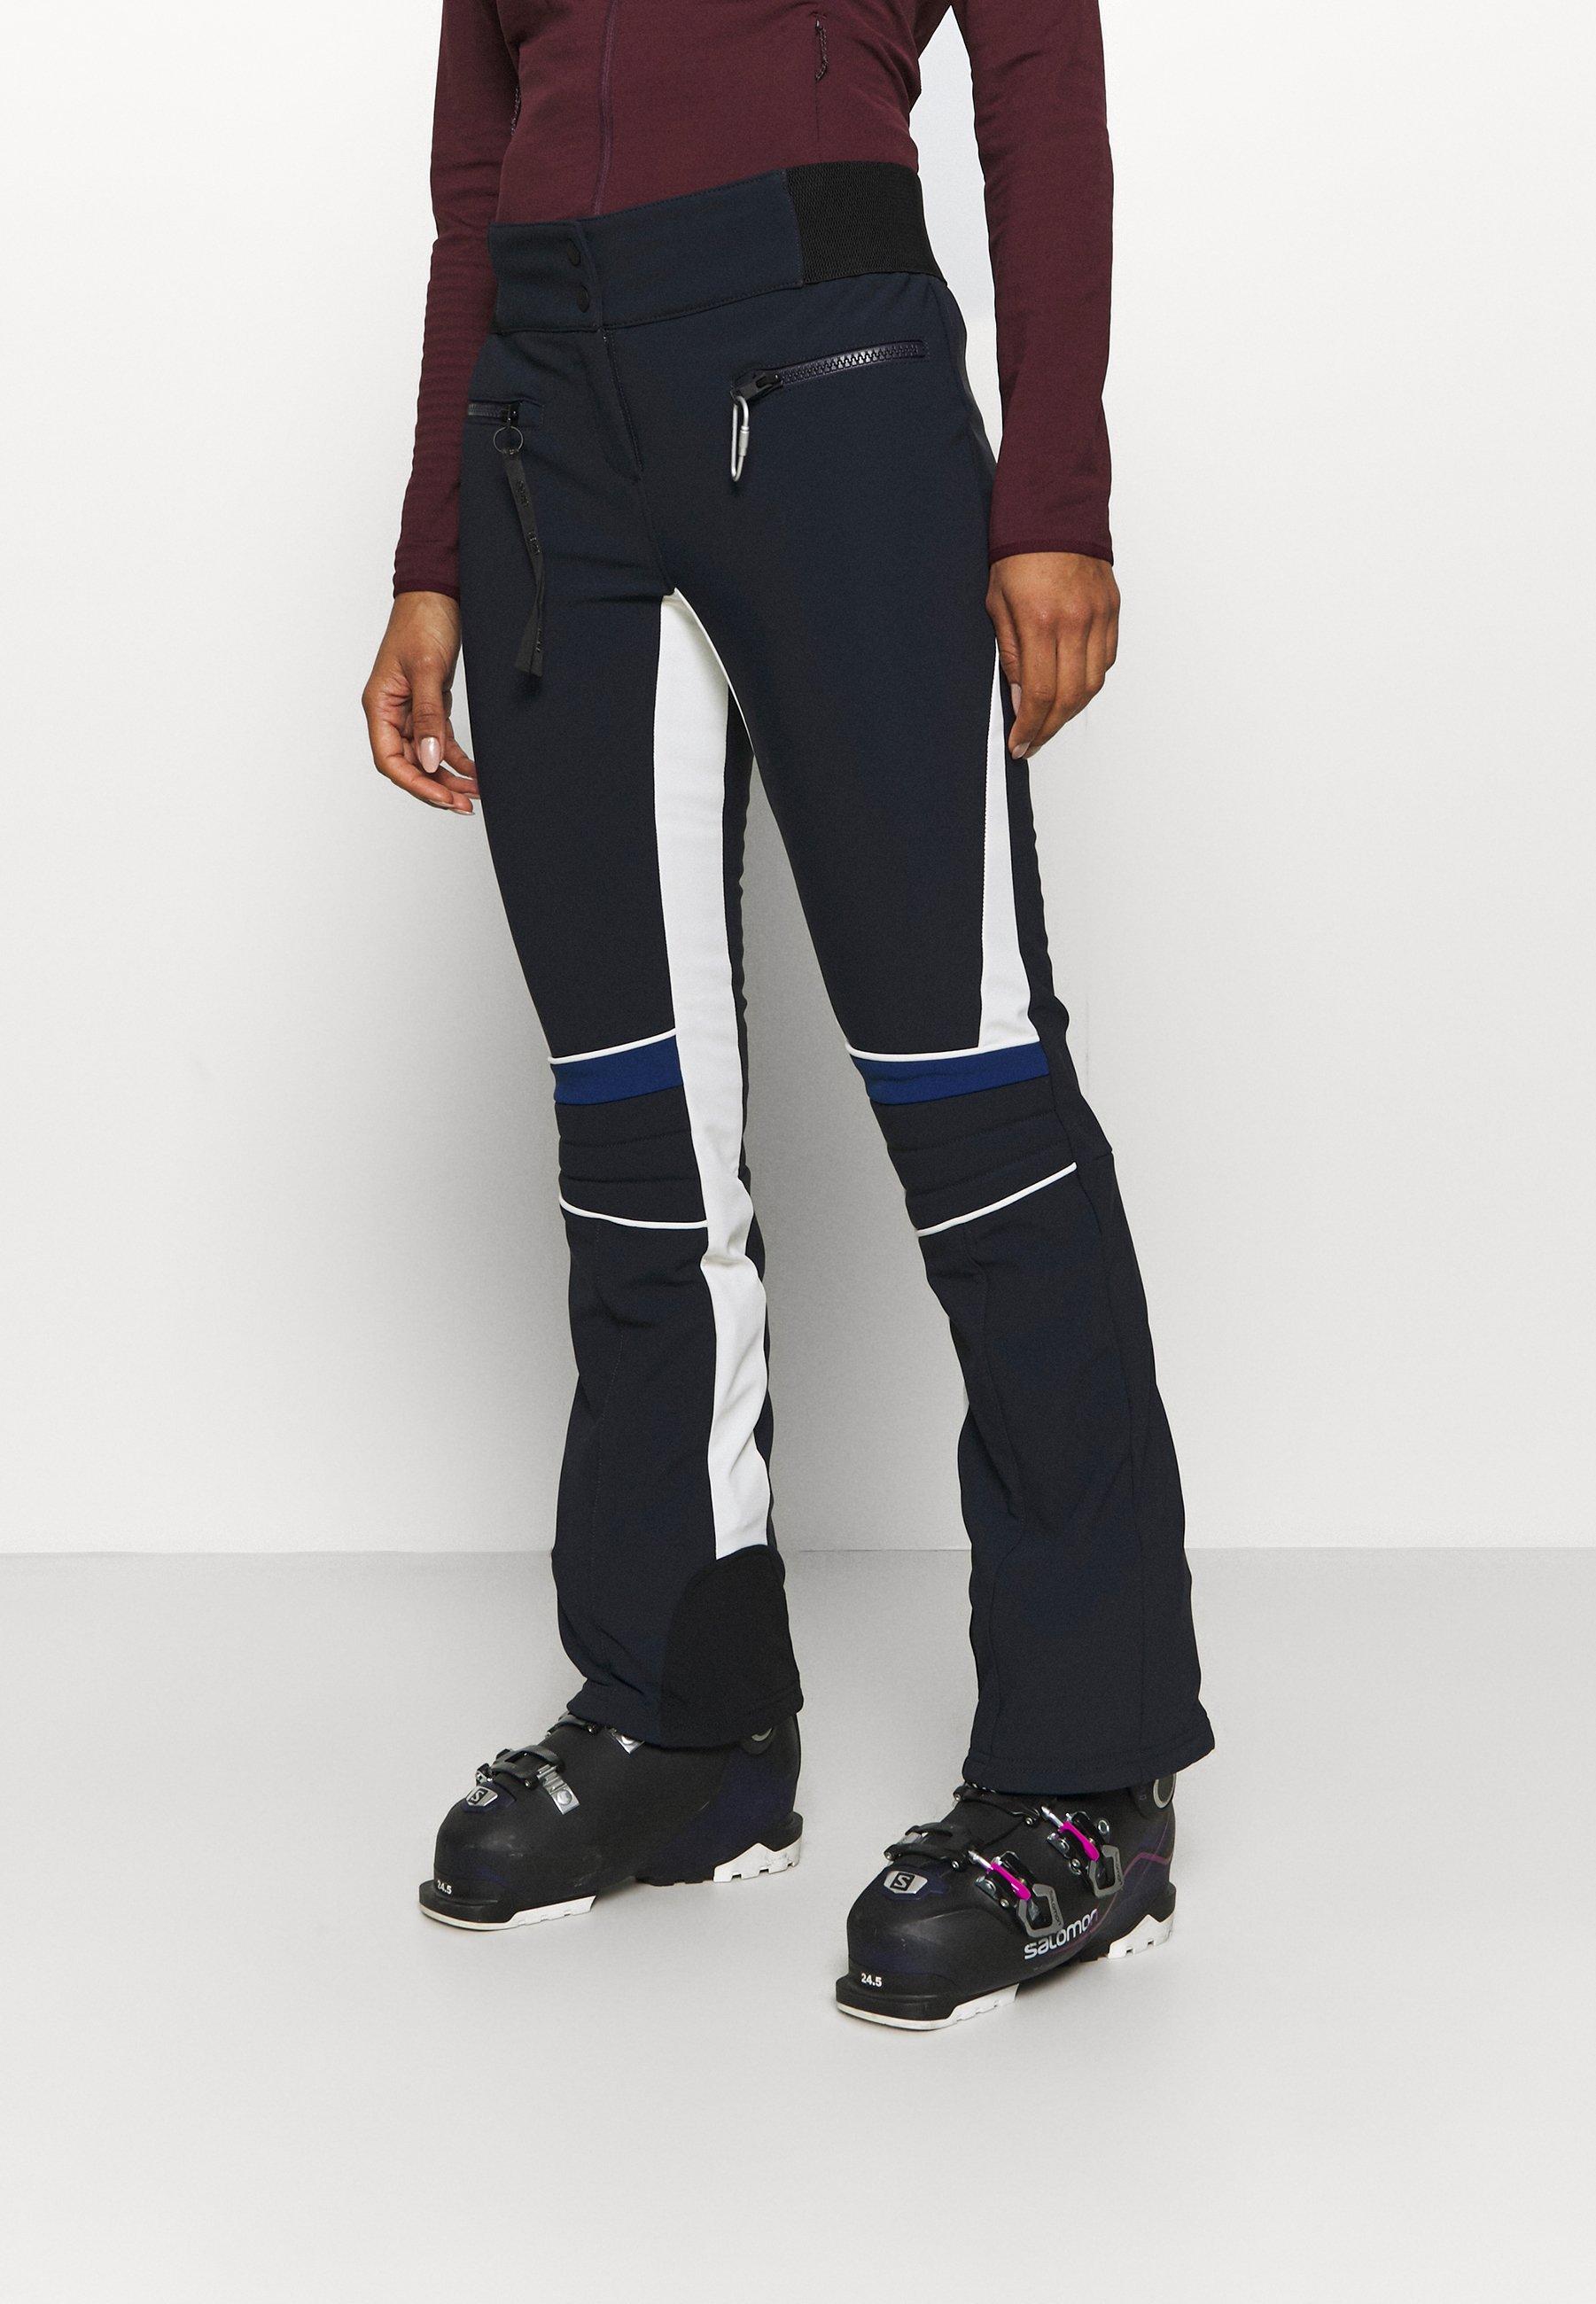 Femme ADELA PANT - Pantalon de ski